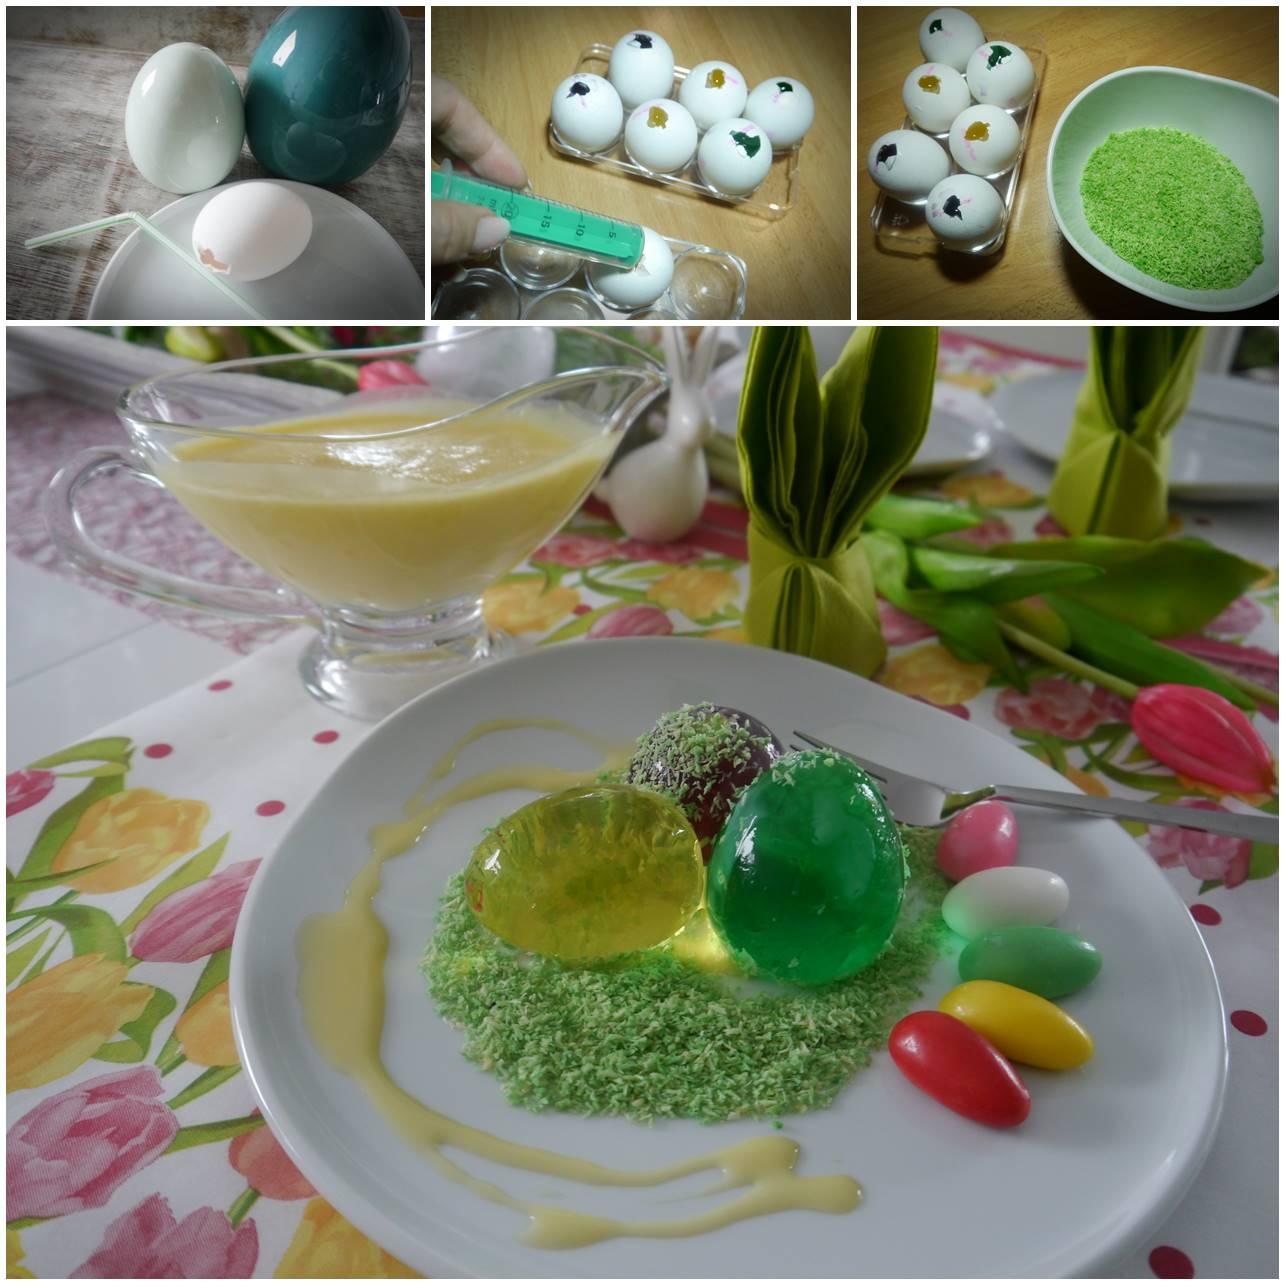 Feiertags stress vermeiden beste best ager 50plus lifestyle fashion mode beauty - Eier kochen ohne anstechen ...